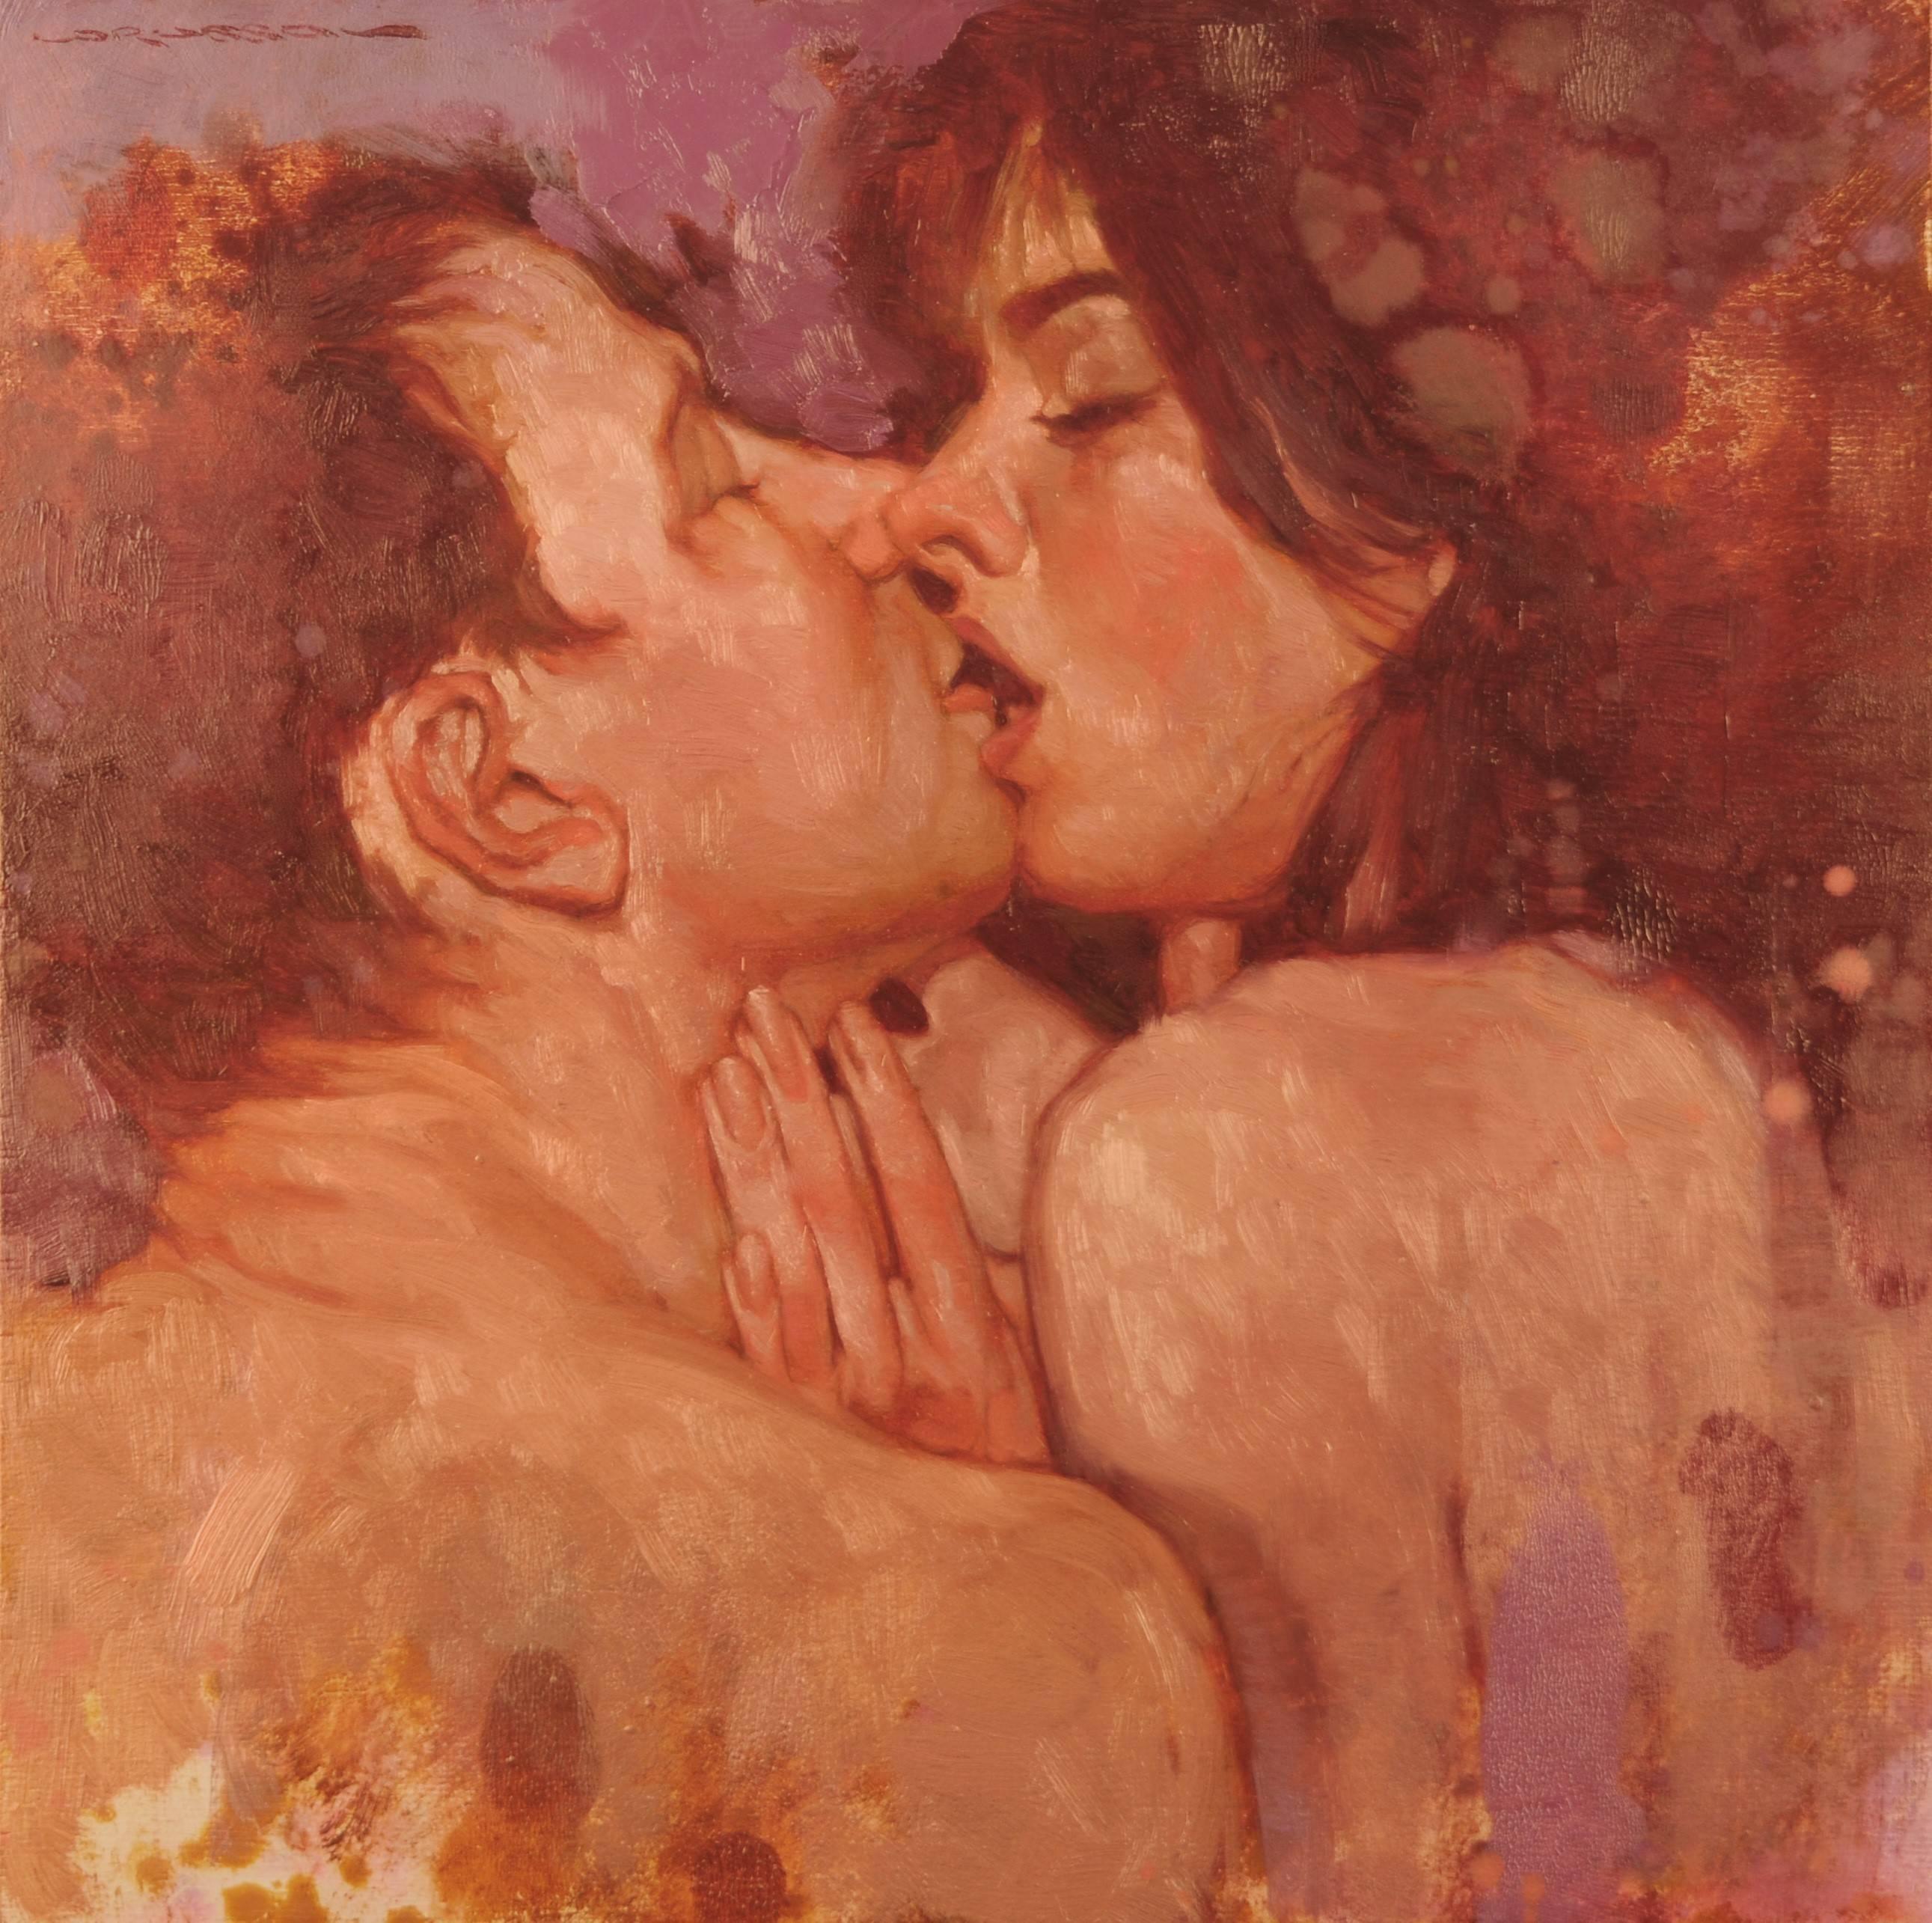 Passionate Kiss Artwork Google Search Joseph Lorusso Kiss Artwork Sketches Of Love